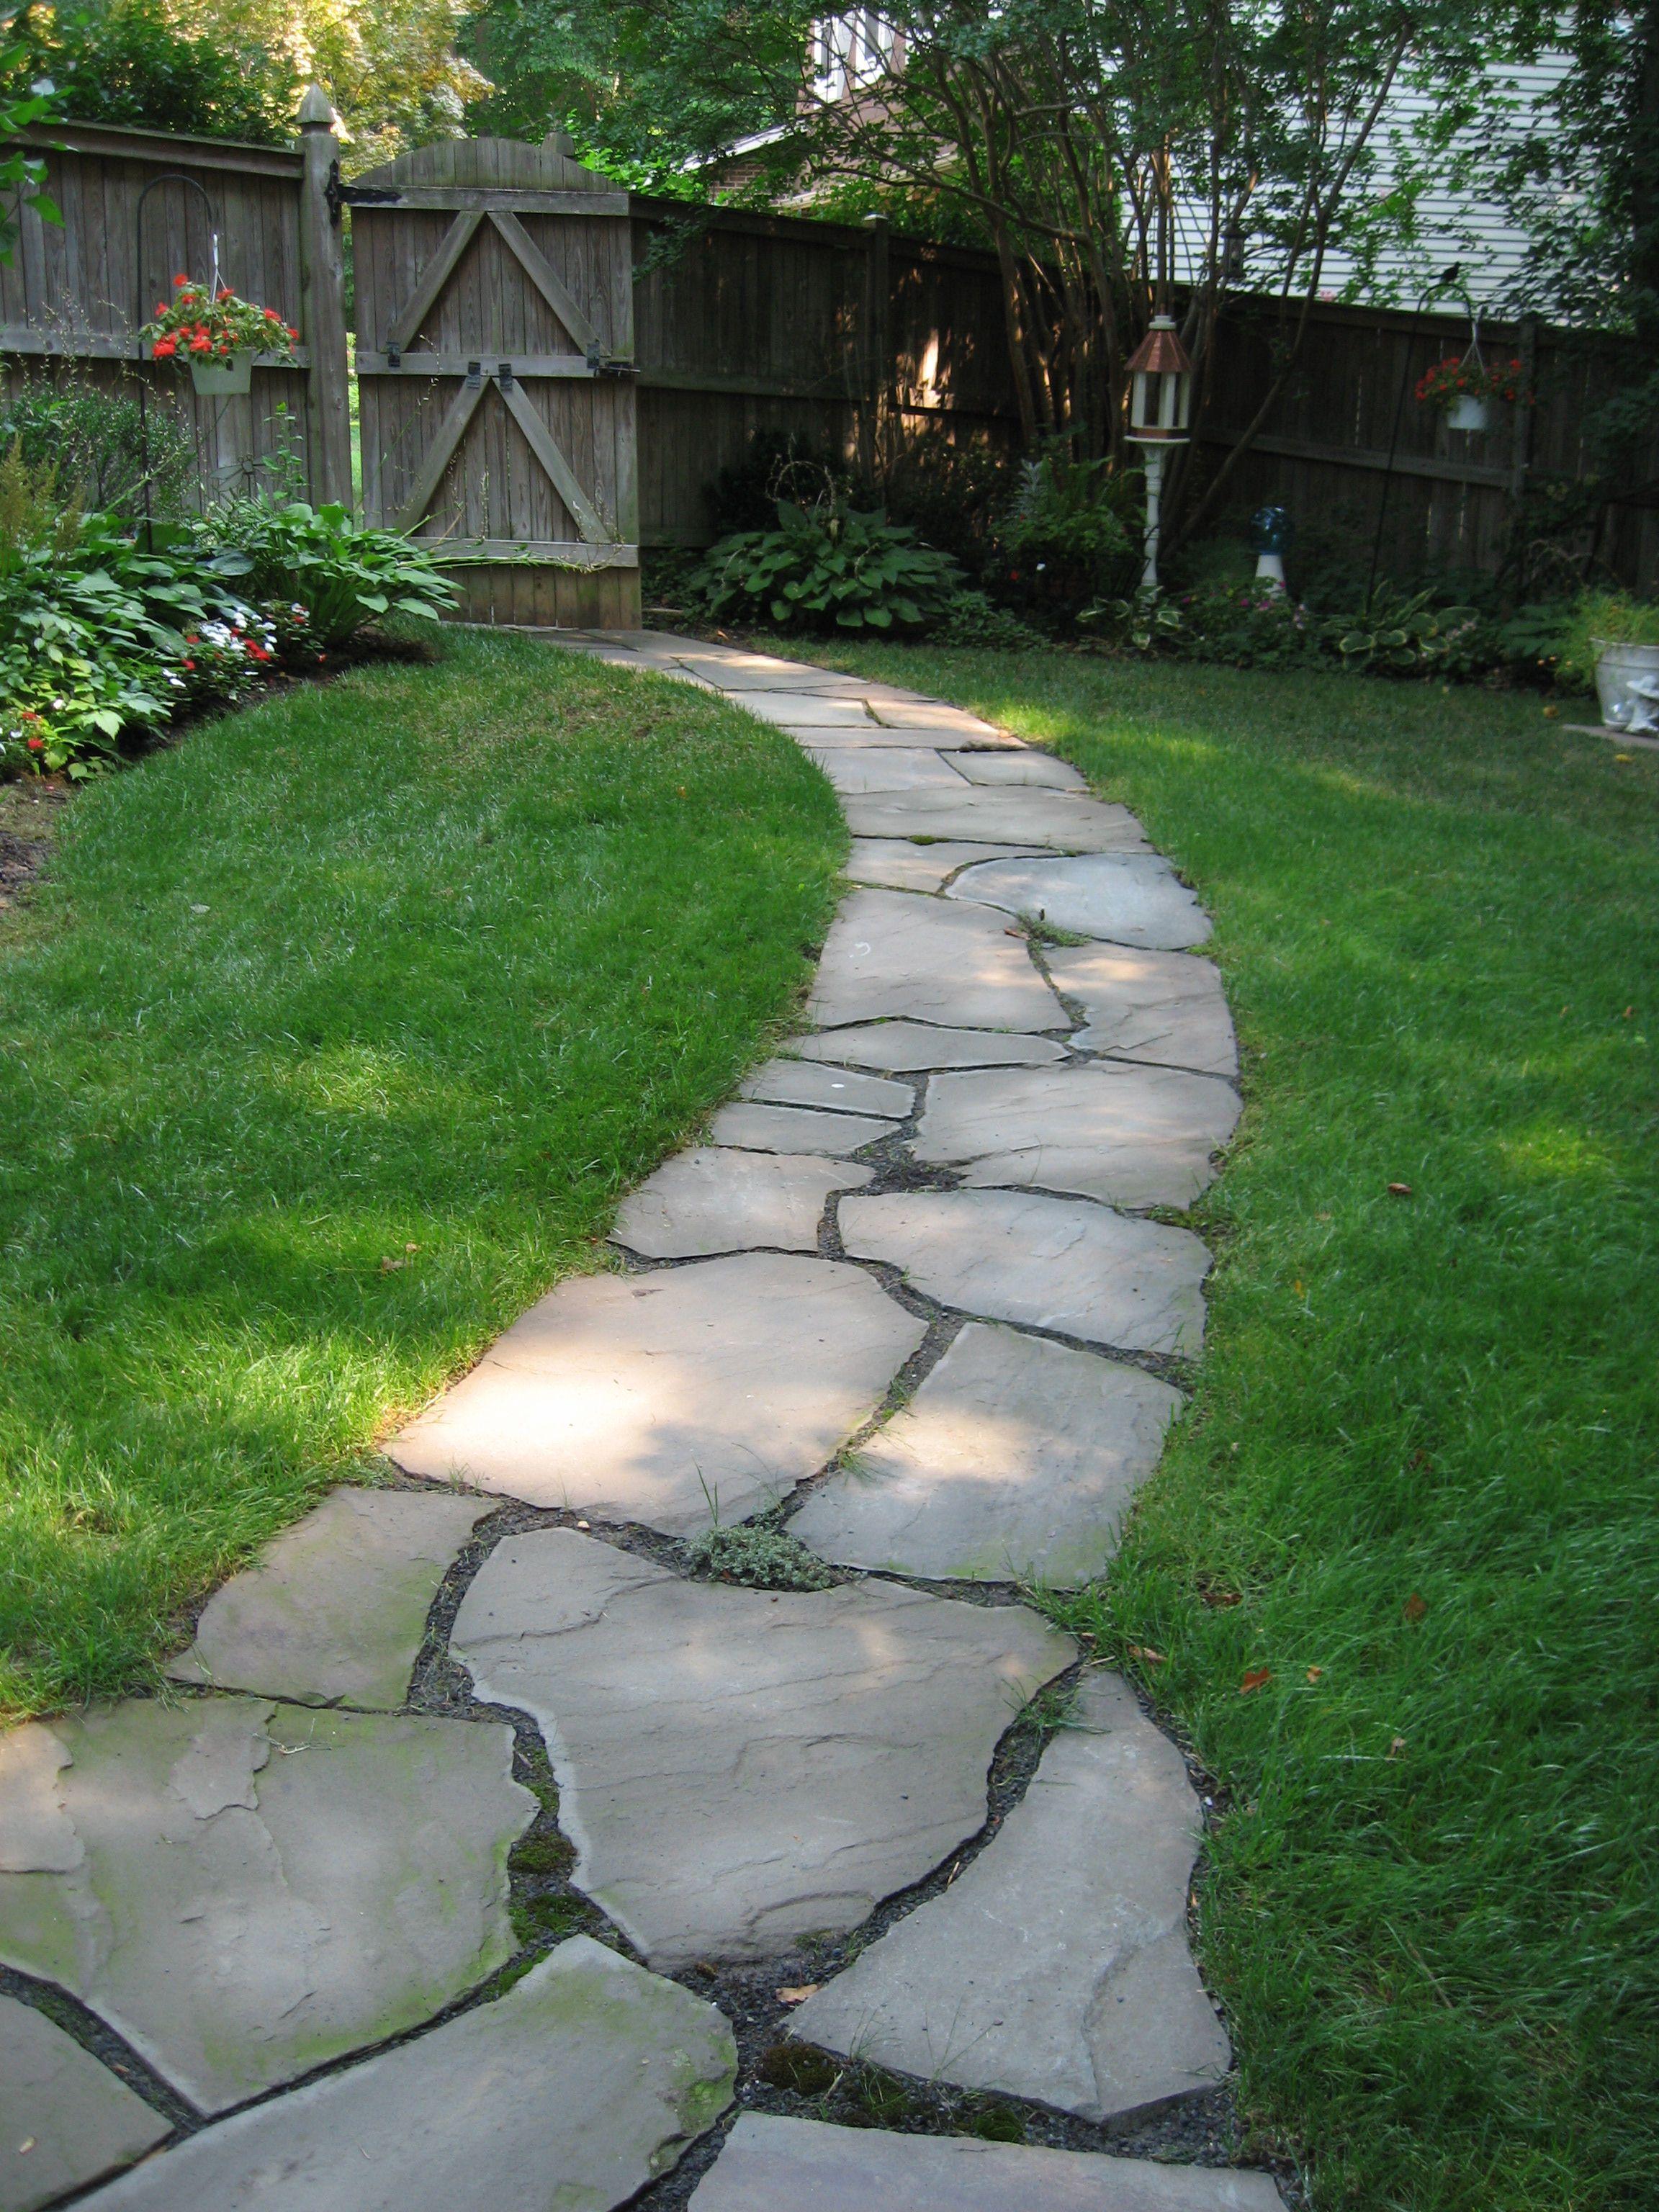 Irregular Flagstone Pathway Side Yard Shade Walkway Landscaping Landscaping With Rocks Pathway Landscaping